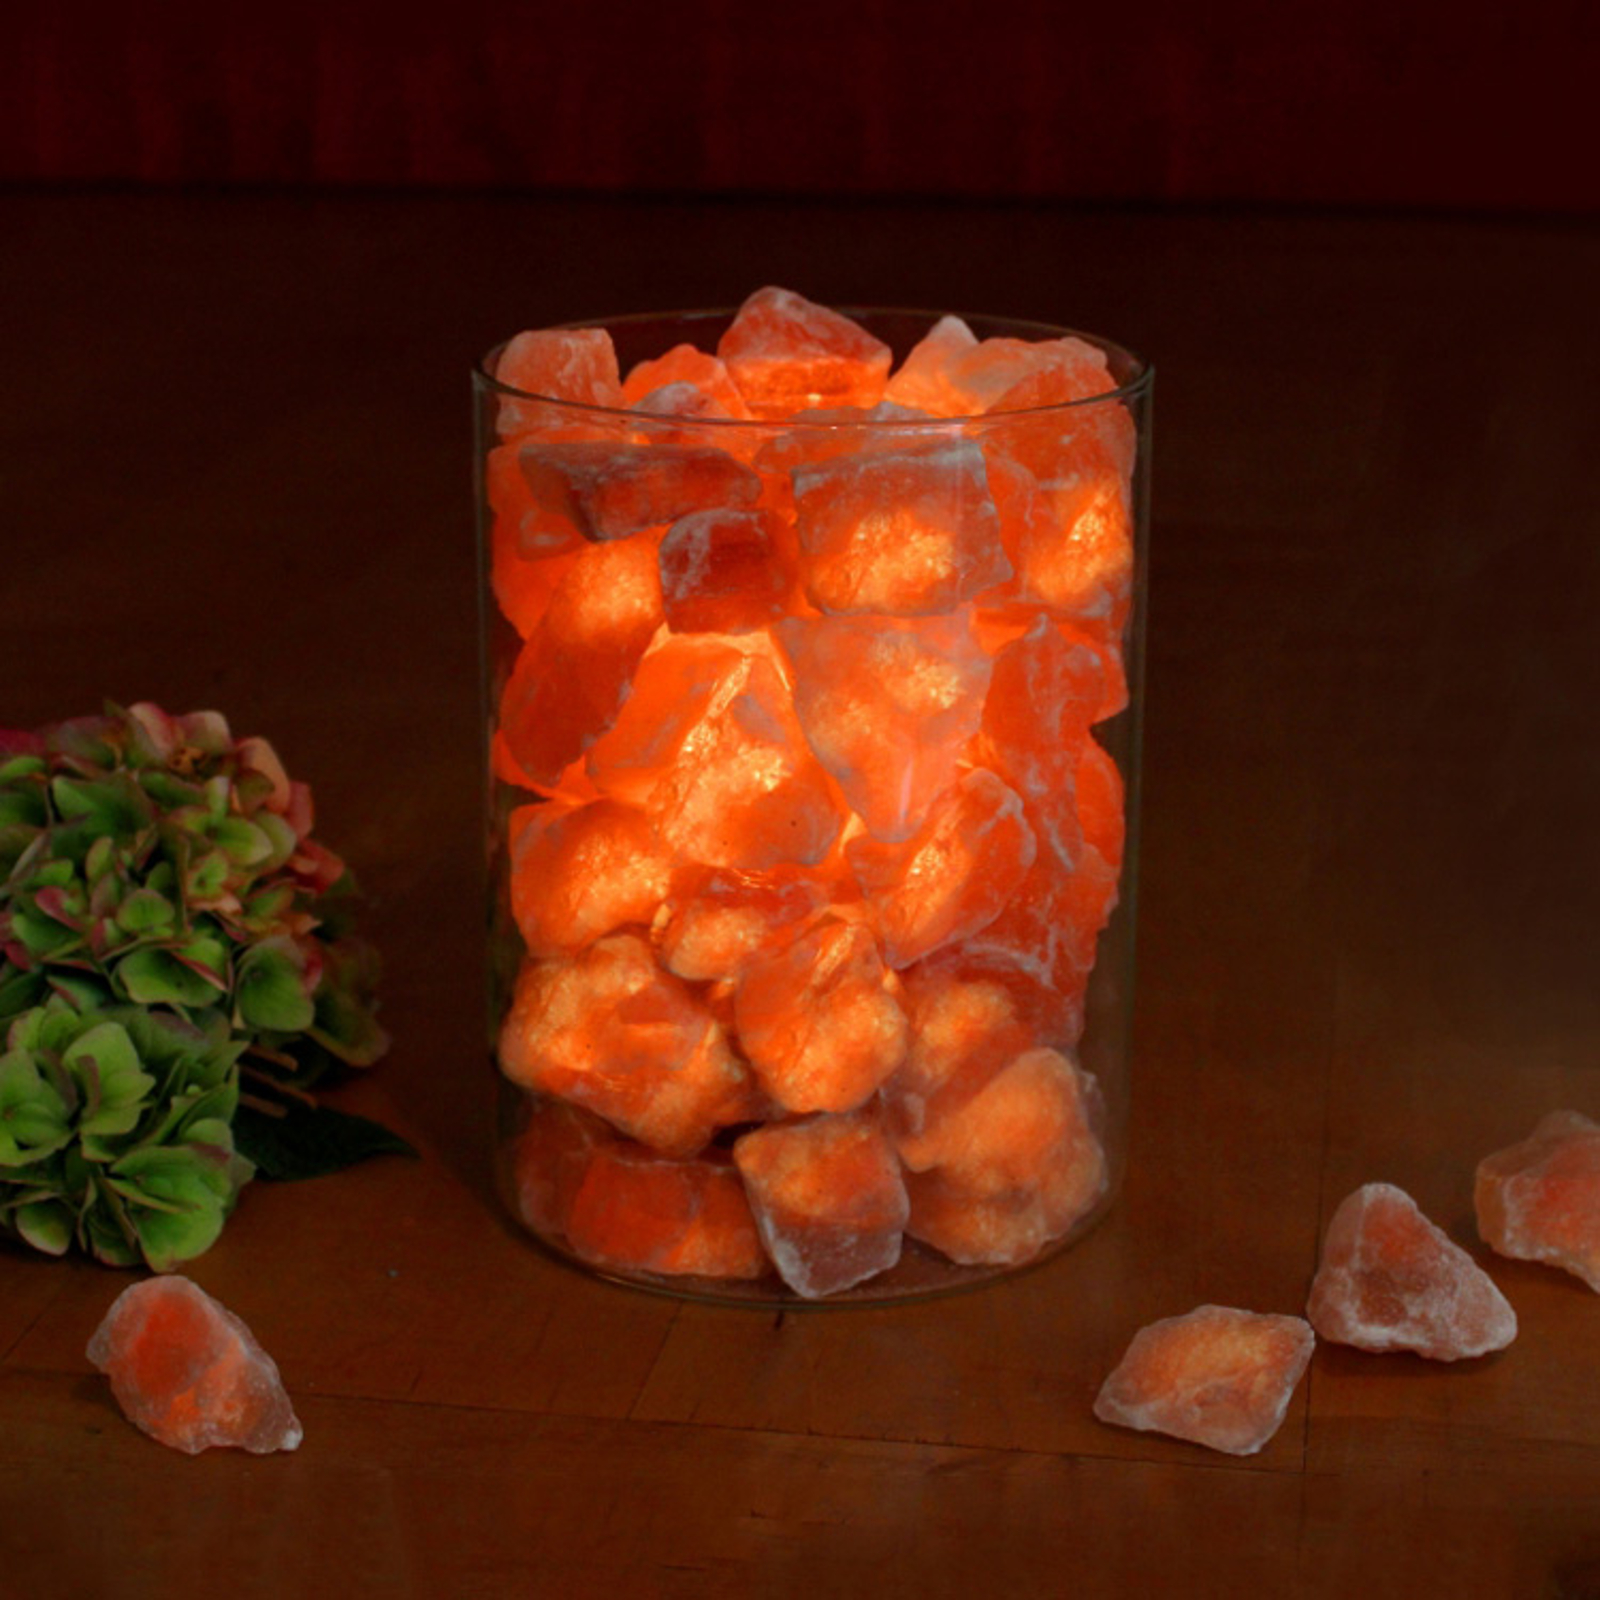 Salzkristall-Feuer im Glas